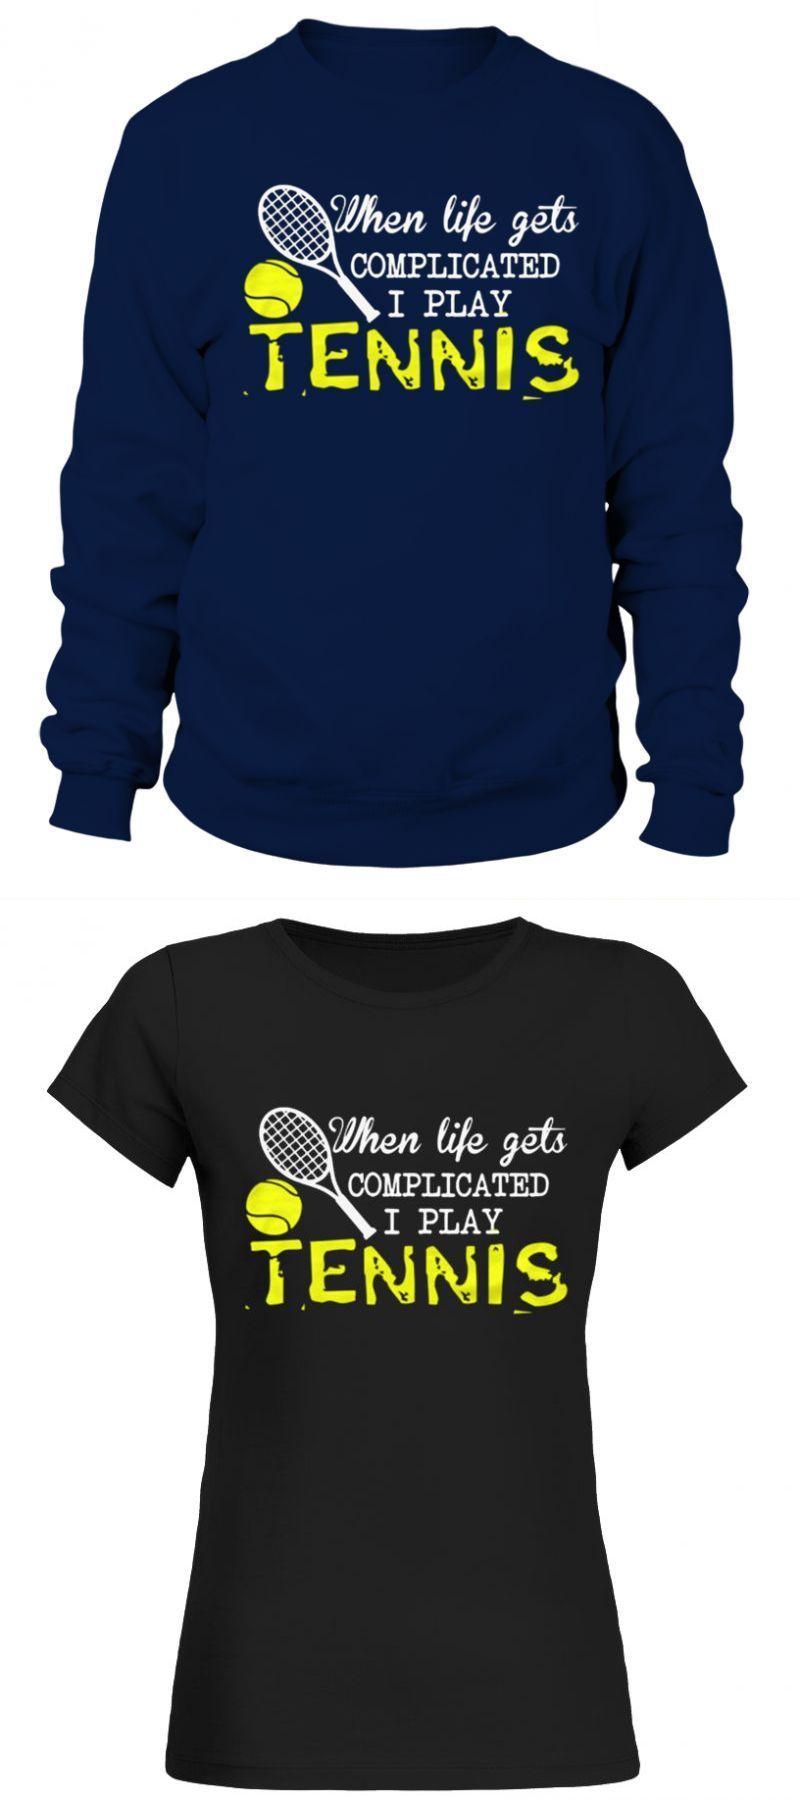 f0b417da8 Tennis ball racket ace sports team player mom dad tenis t shirt #tennis # ball #racket #ace #sports #team #player #mom #dad #tenis #shirt #nike #mens  ...